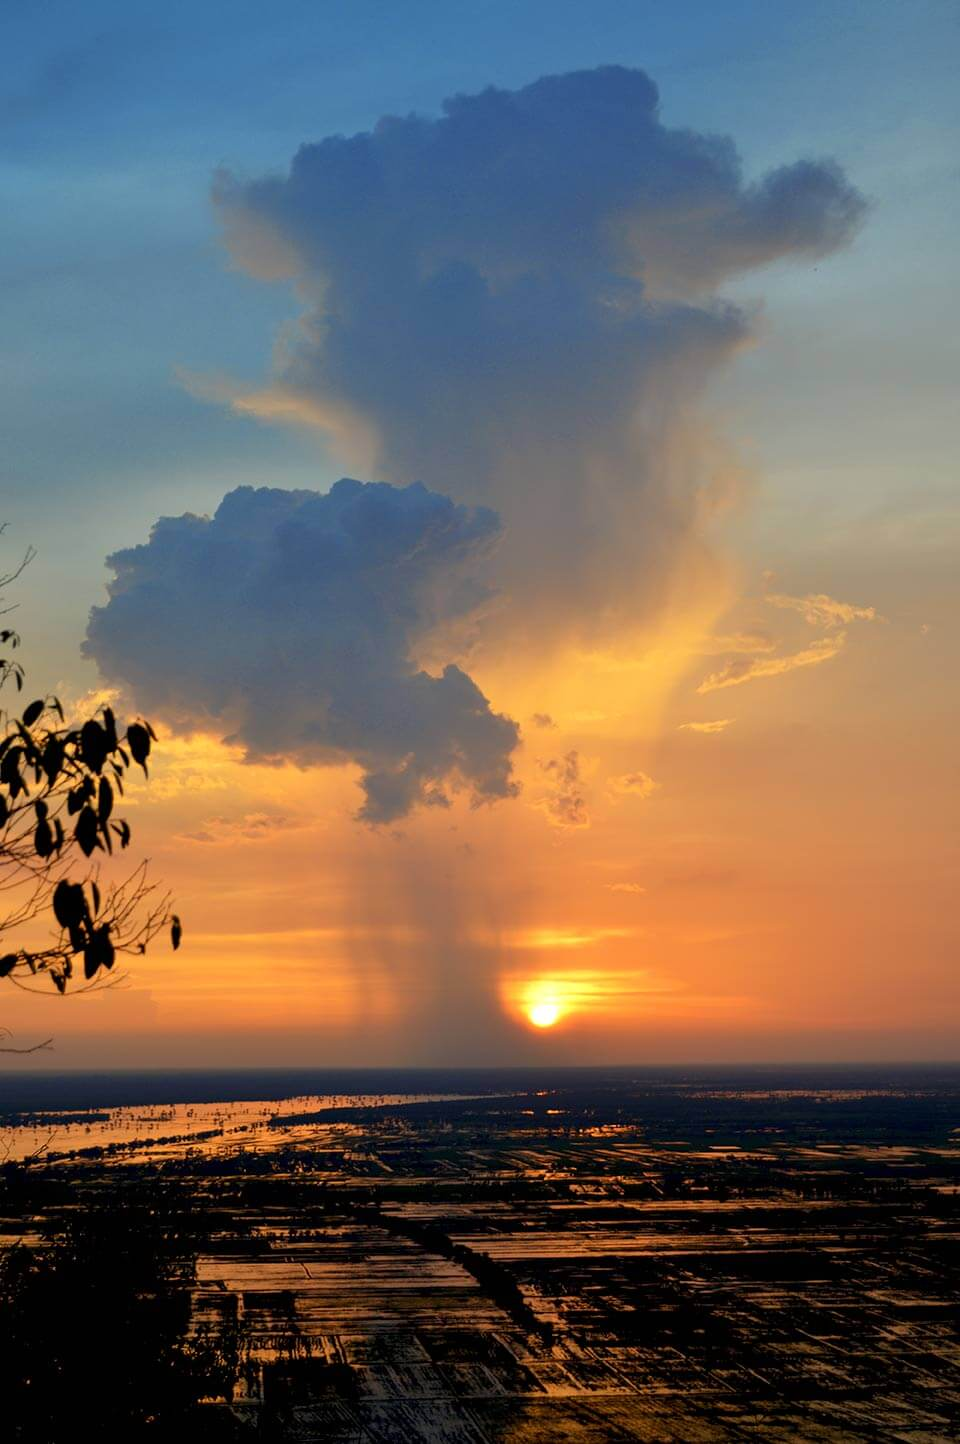 Sonnenuntergang im Angkor Park vom Phnom Krom